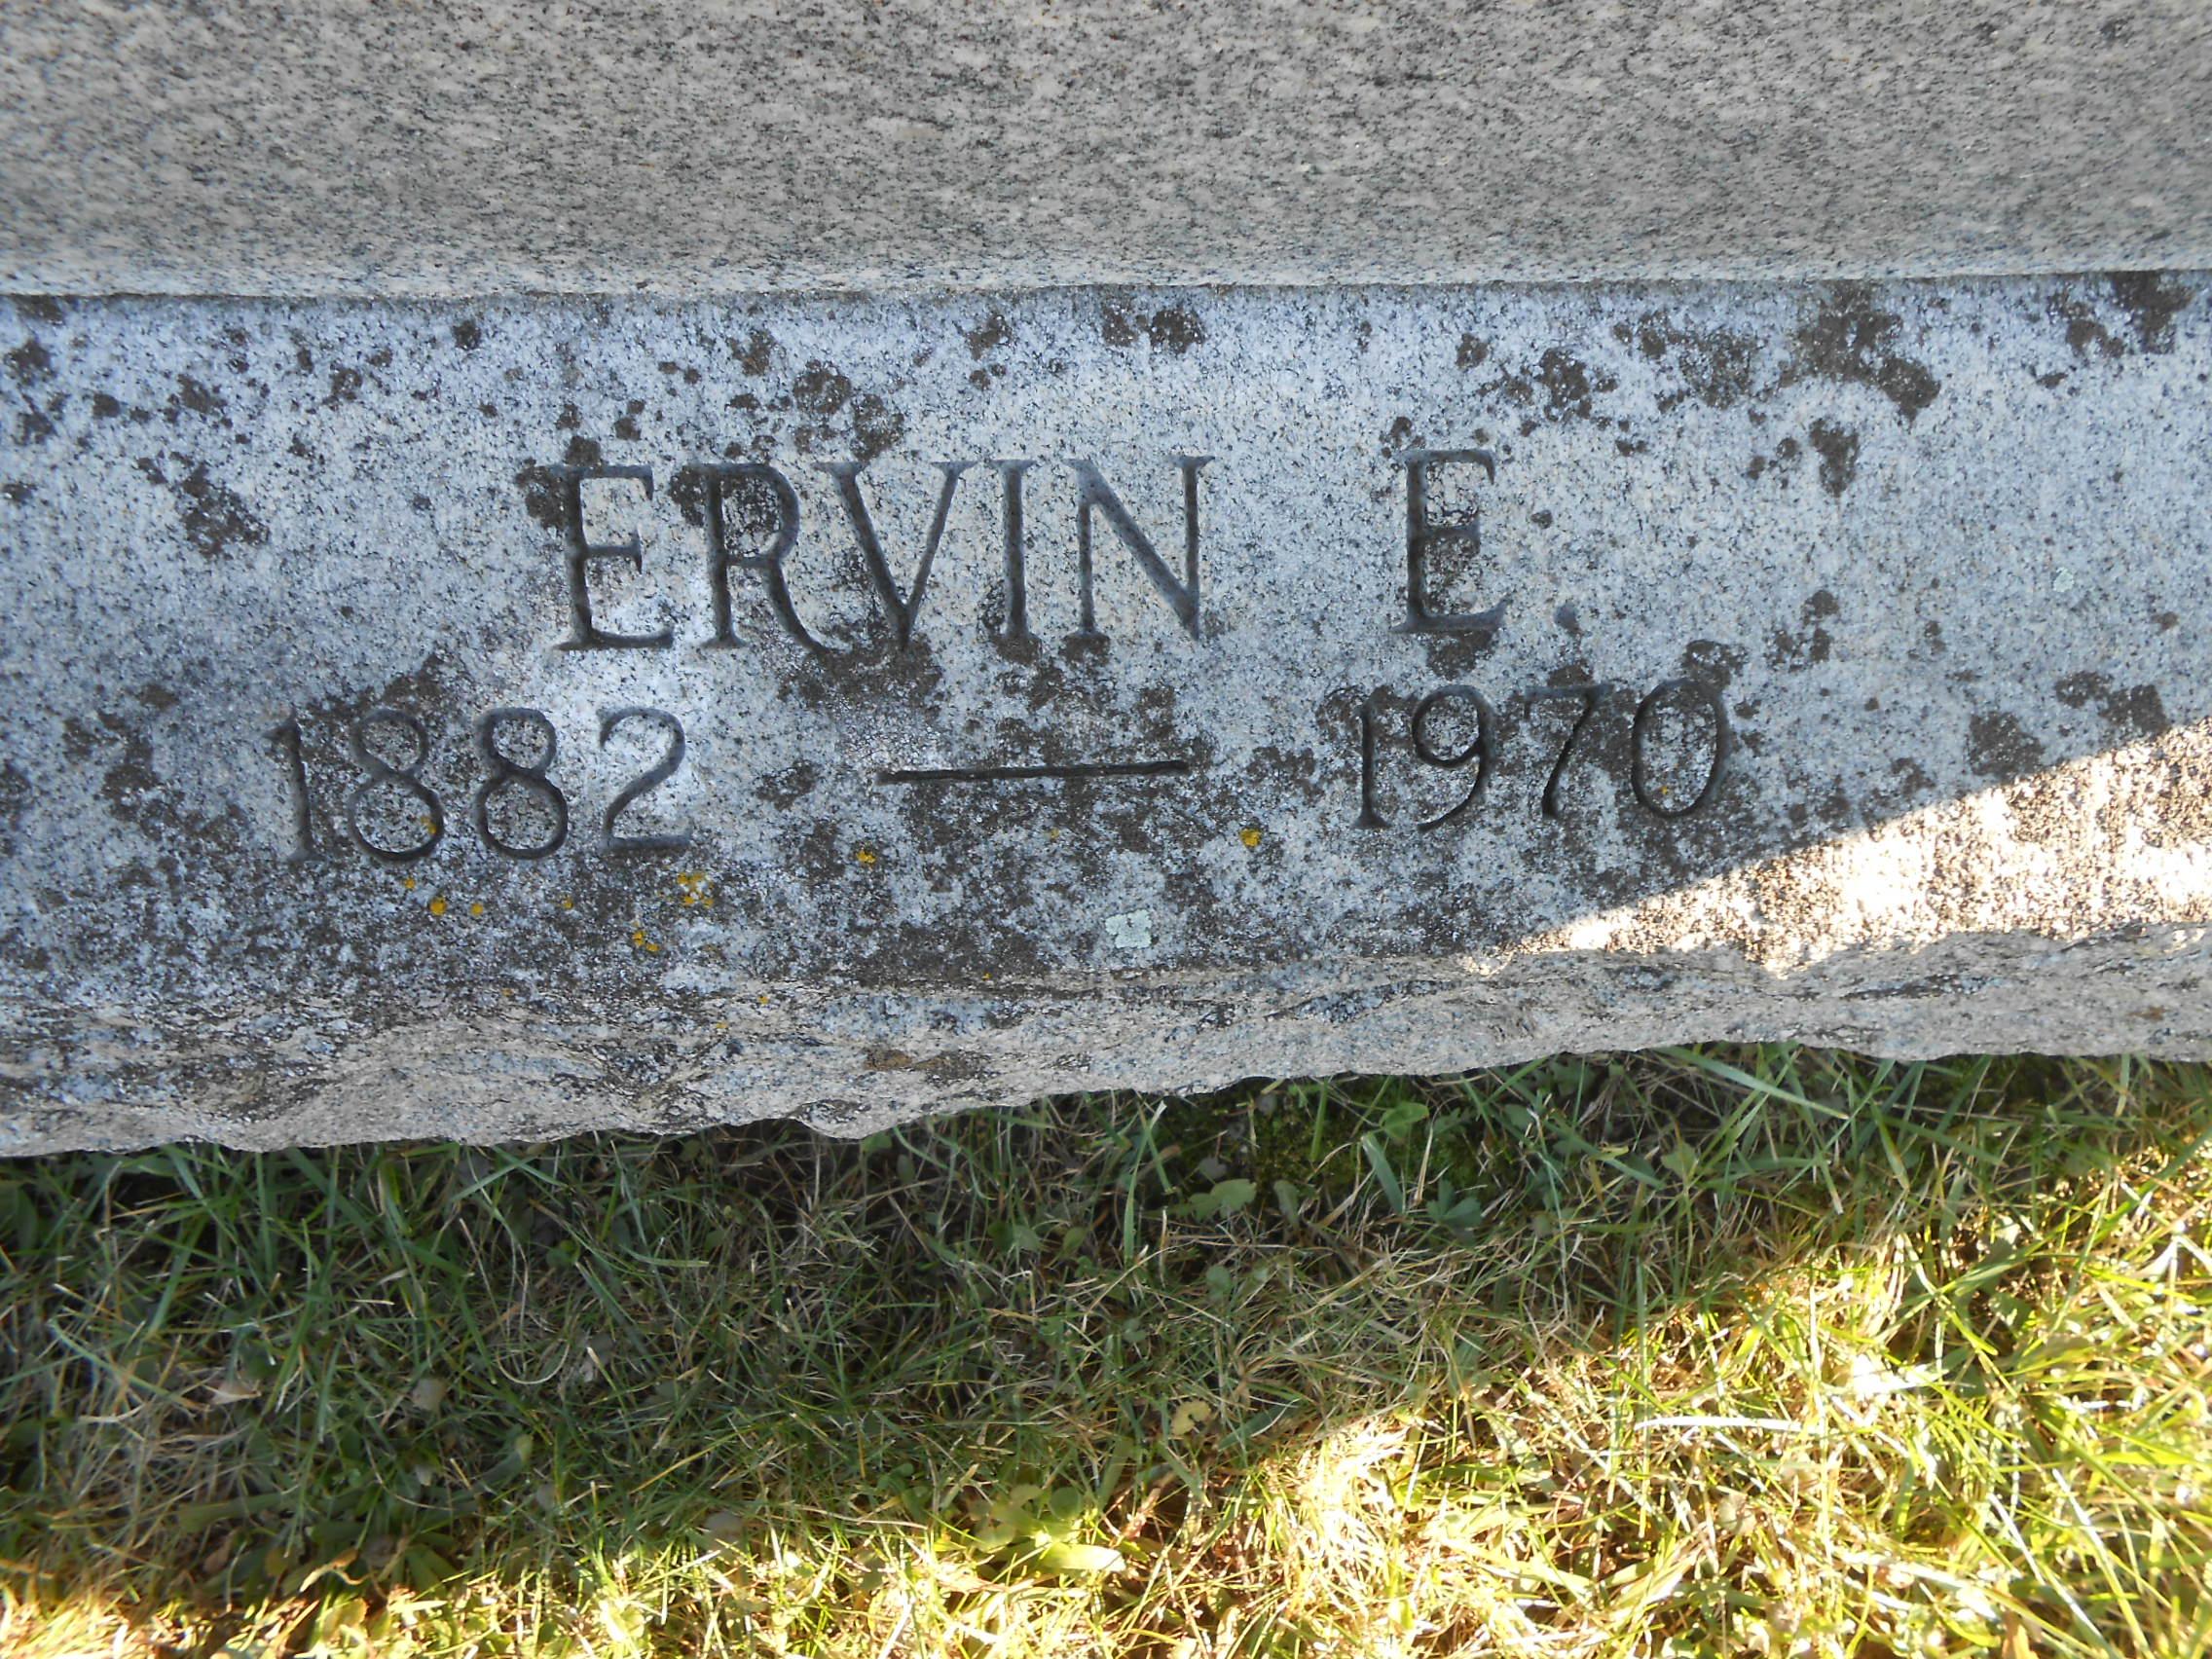 Ervin Ezra Kreger